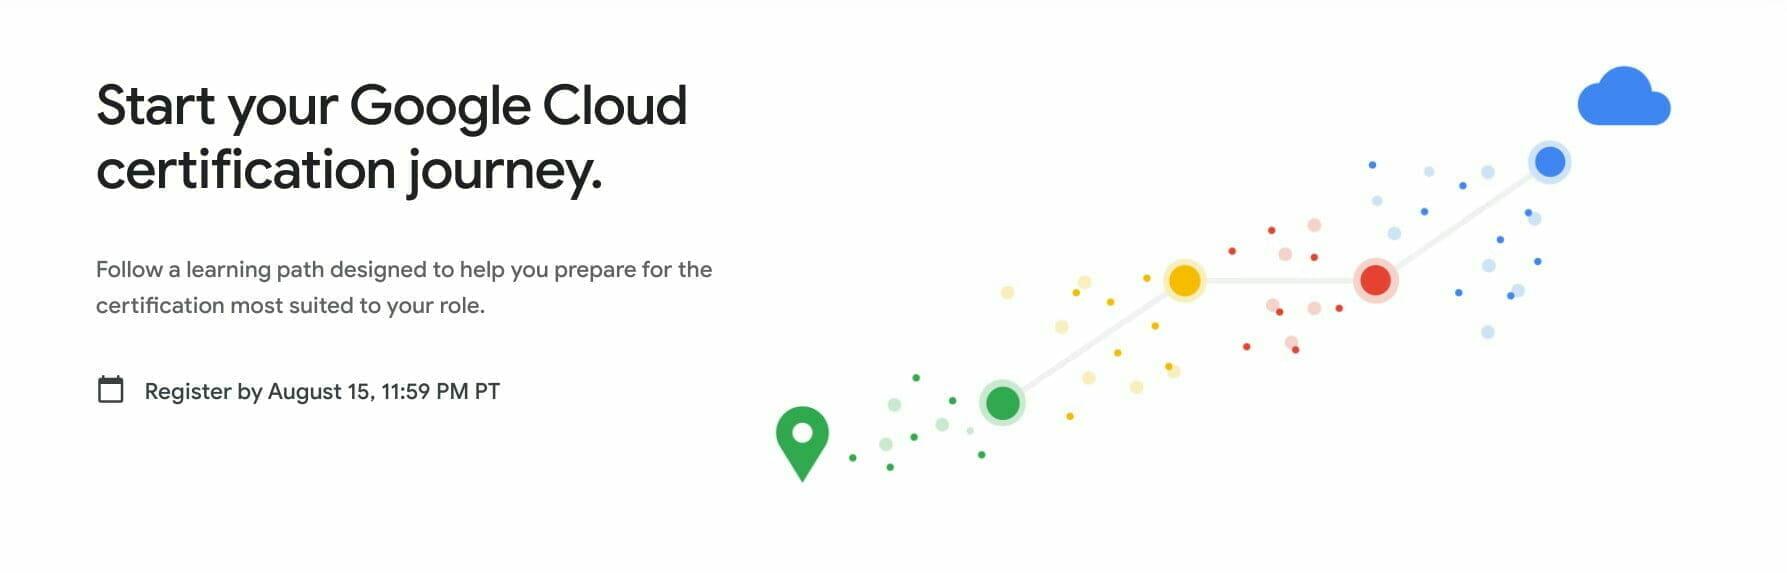 Start your Google Cloud certification journey.